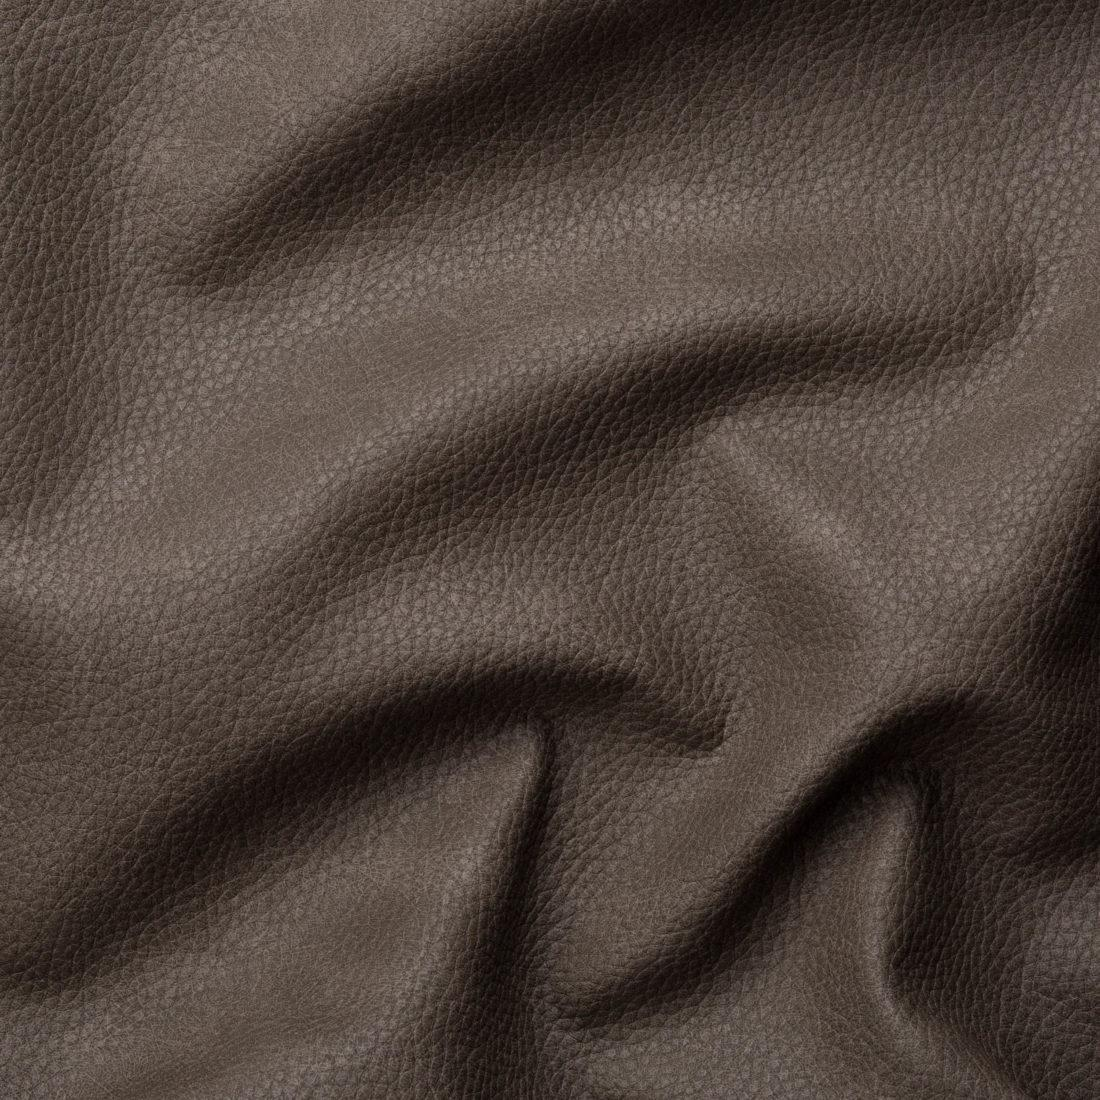 Меблева тканина Wave 108 Stone, штучна шкіра